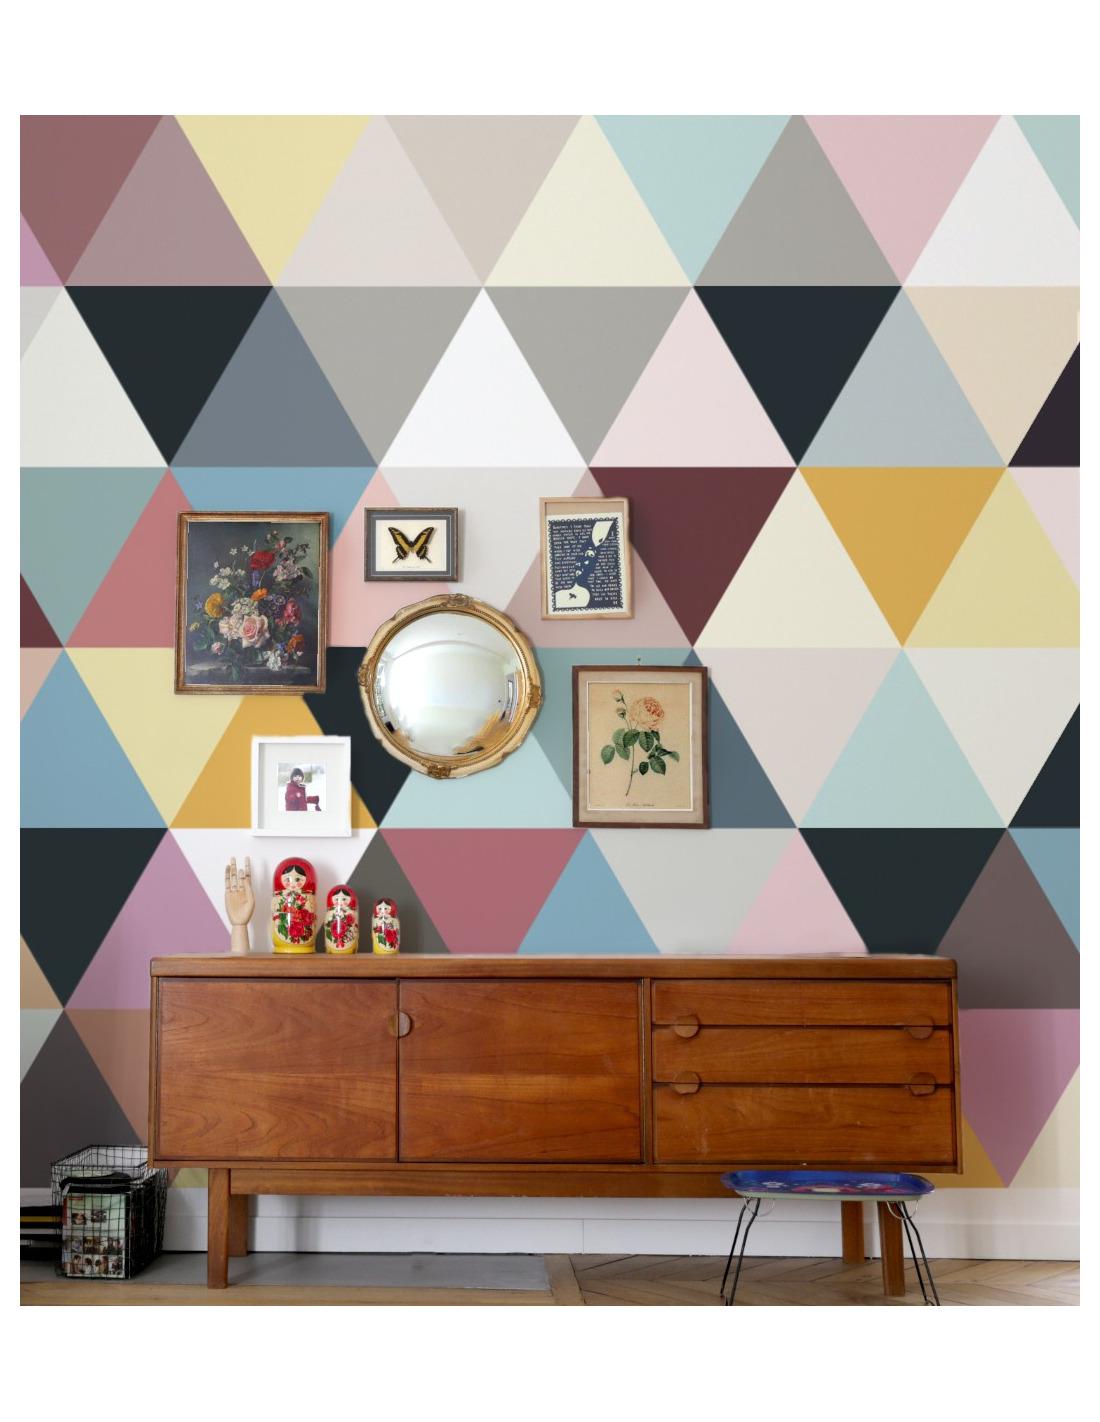 papier peint design intiss mosaic soft au design g om trique. Black Bedroom Furniture Sets. Home Design Ideas